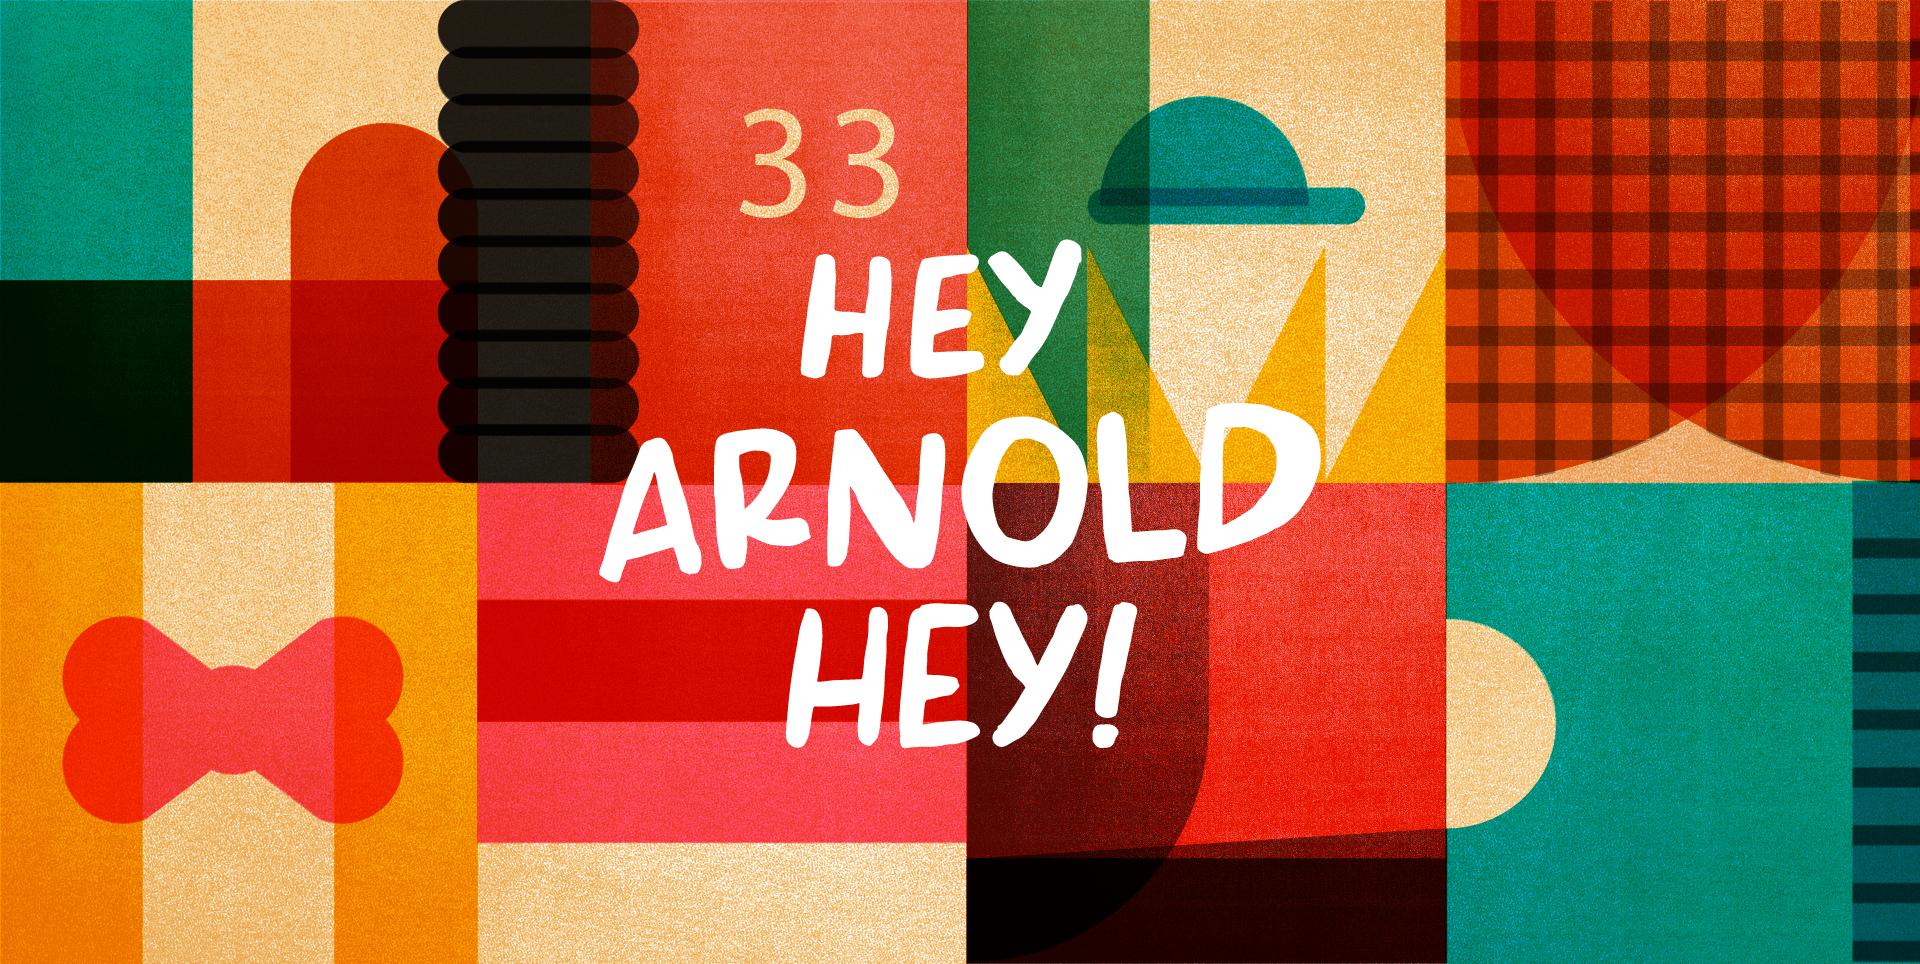 hey arnold hey!